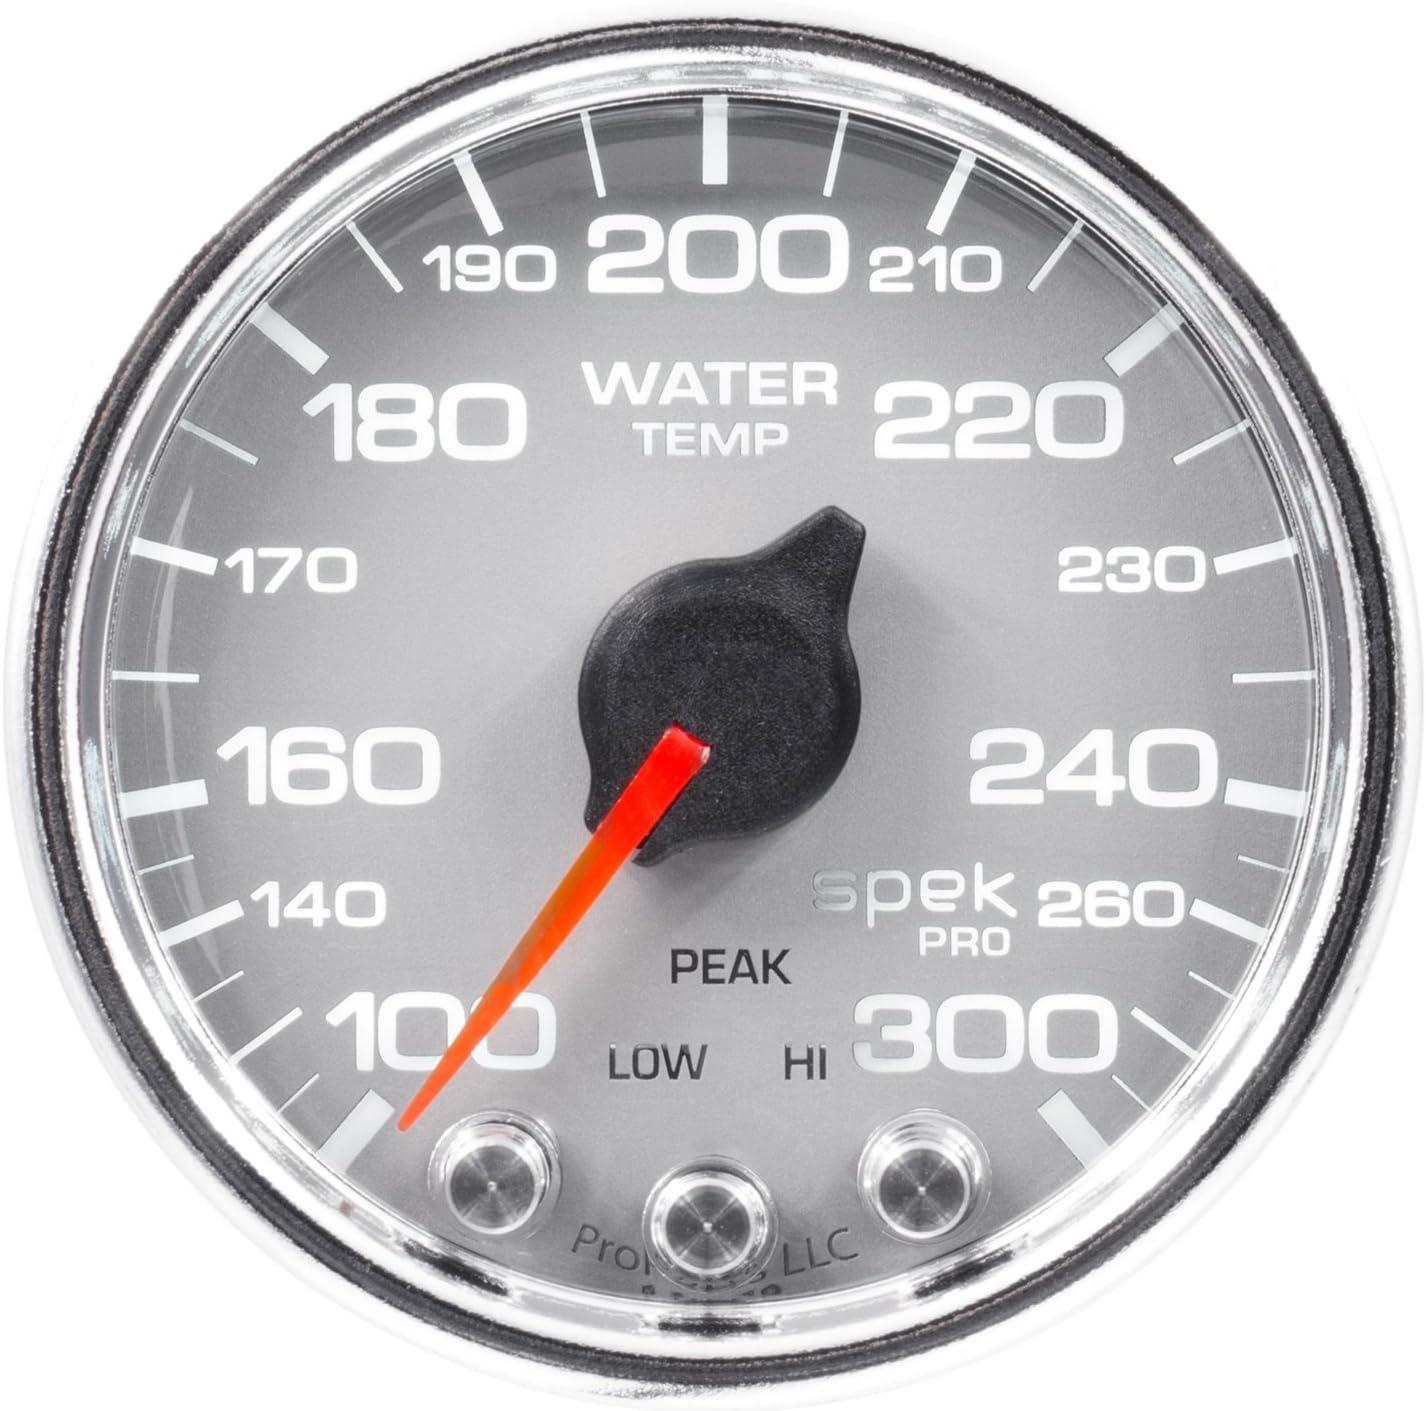 Slvr//Blk Auto Meter P30522 Gauge Stepper Motor W//Peak /& Warn Boost 2 1//16 100Psi Spek-Pro 2 1//16